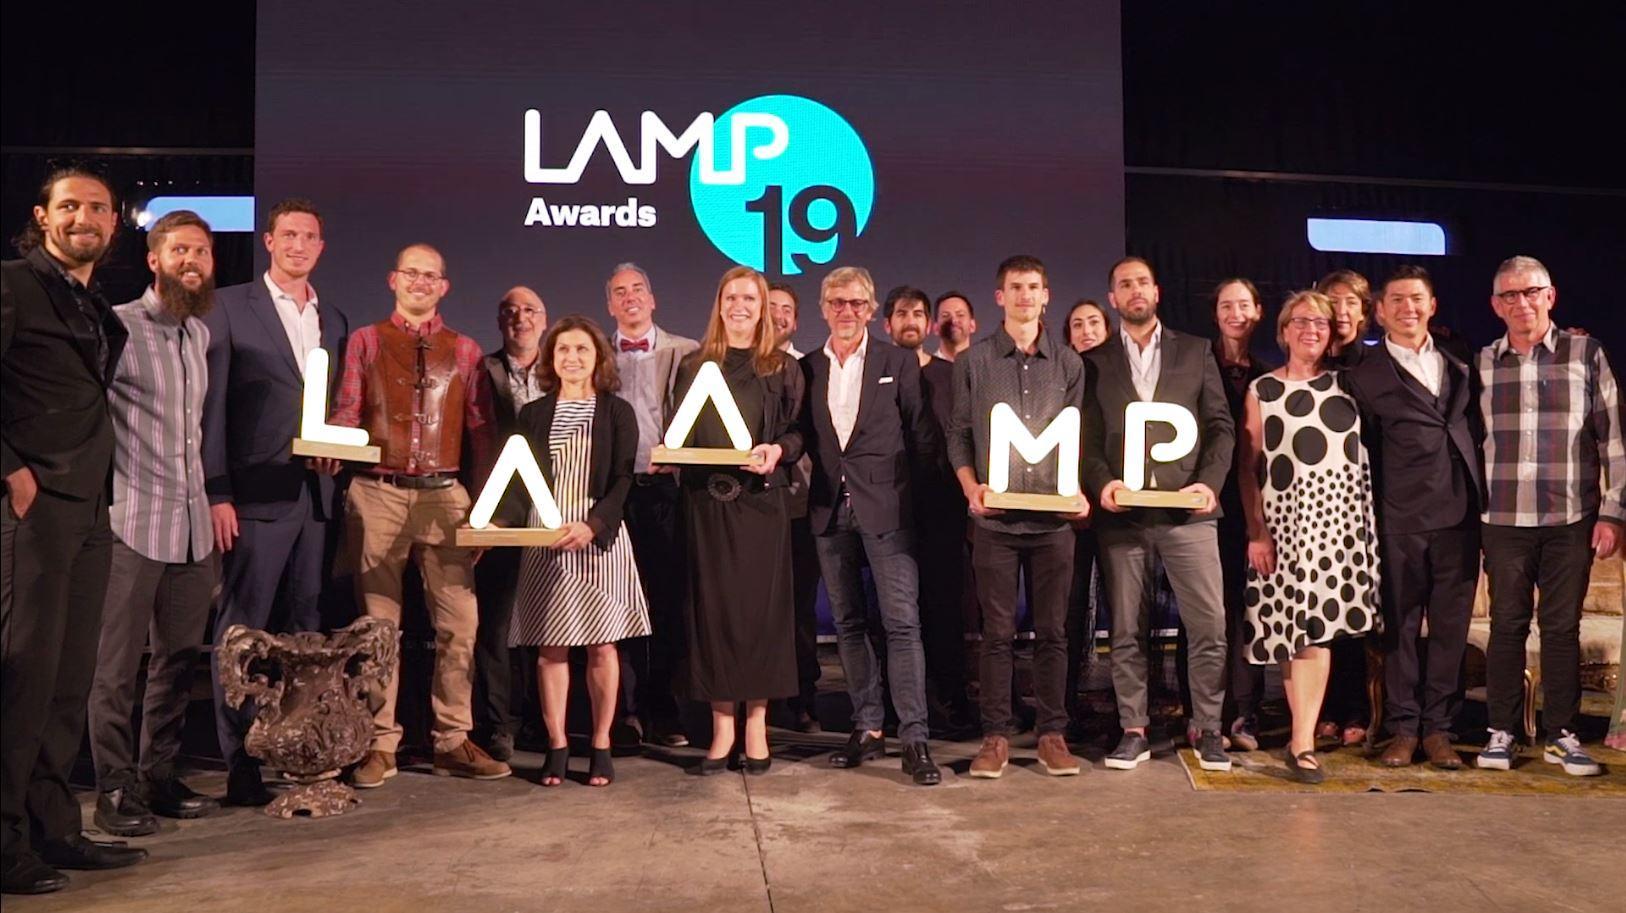 lamp awards 2019 winners video